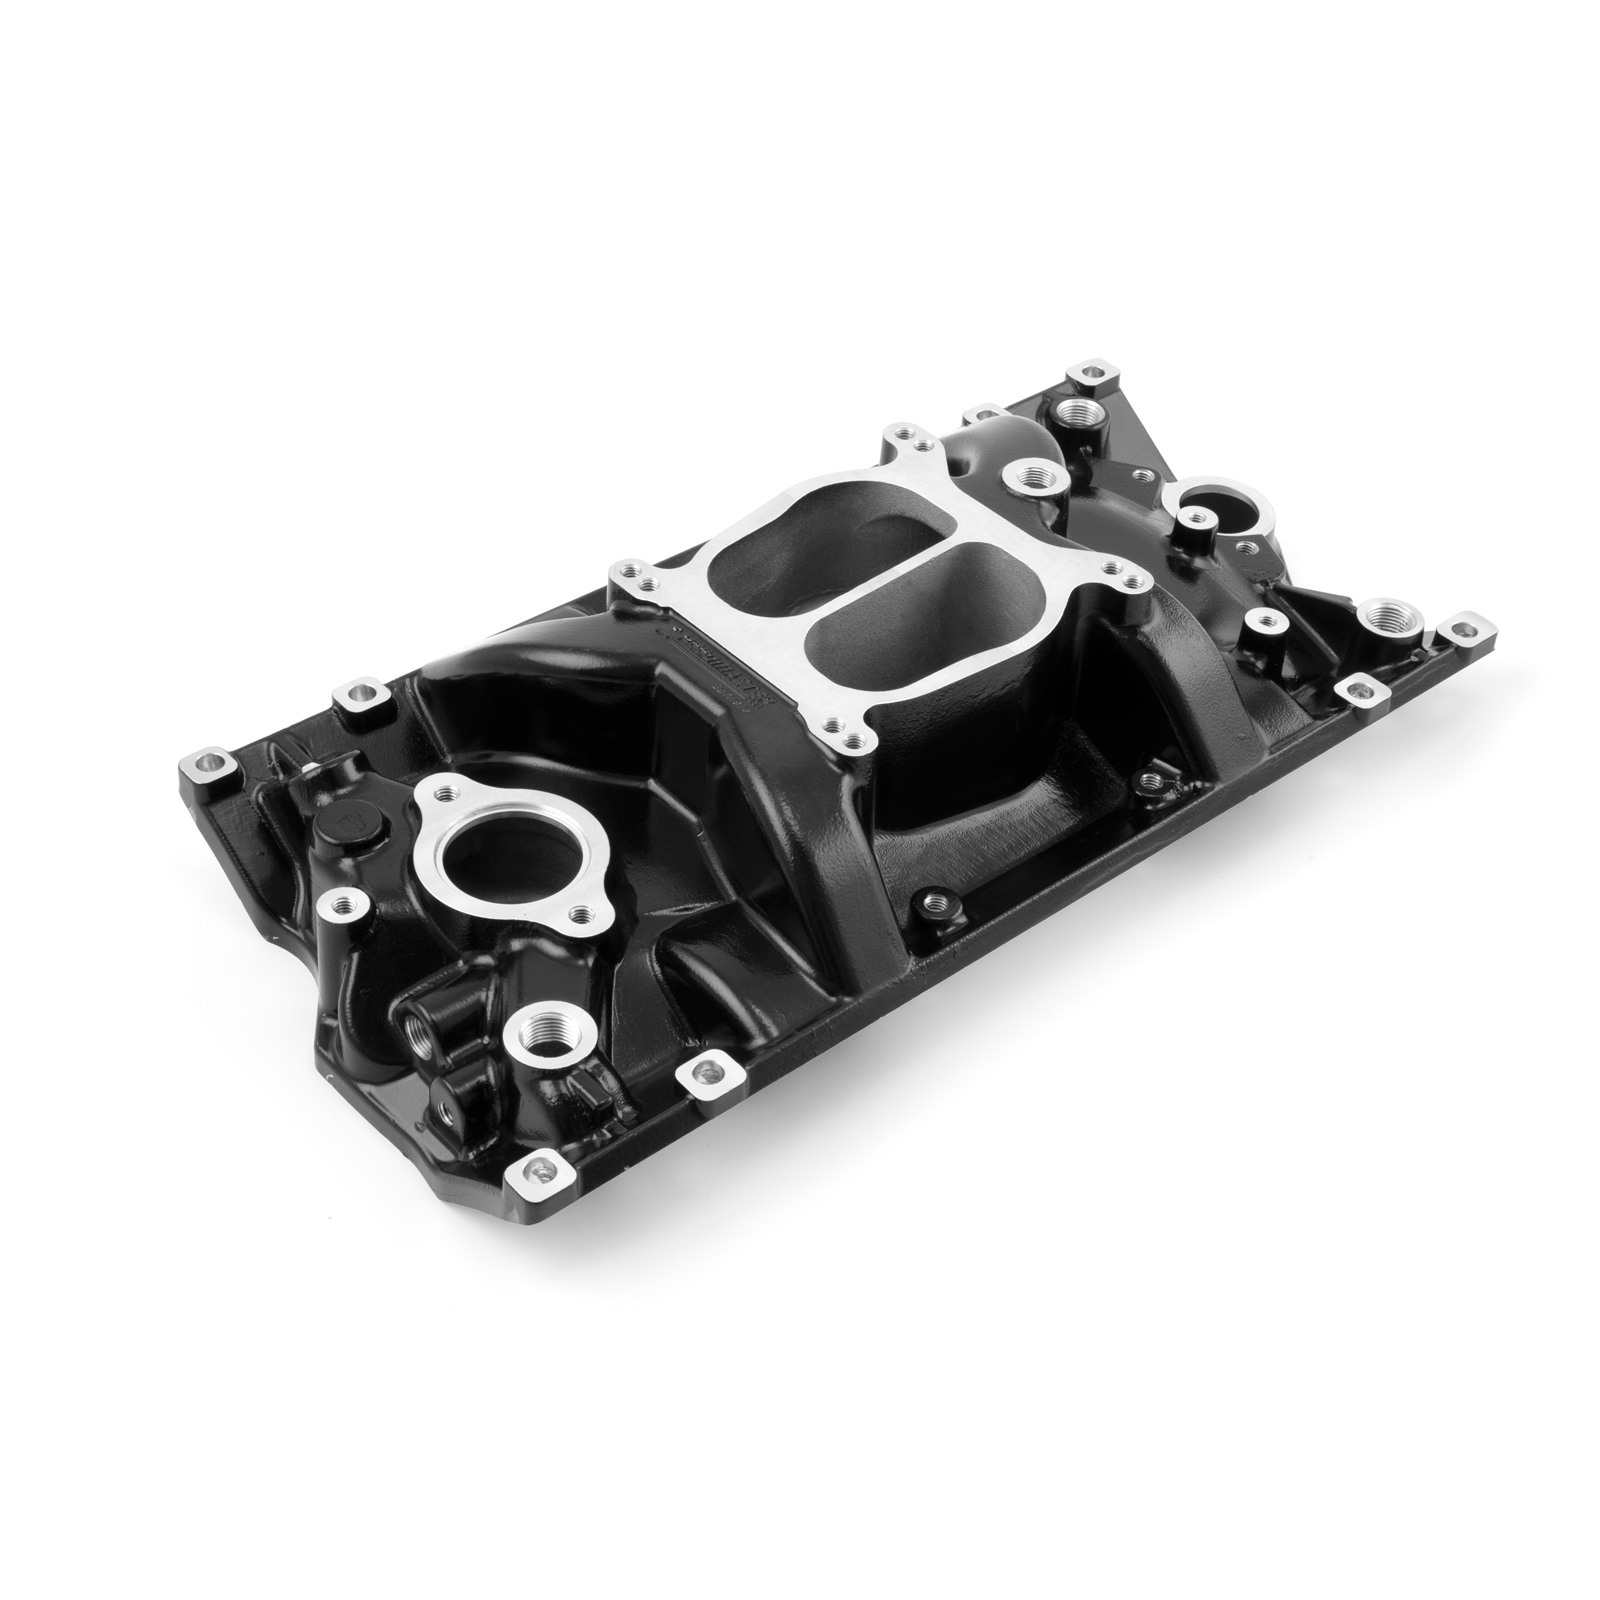 Chevy SBC 350 LowRise Vortec Intake Manifold Black